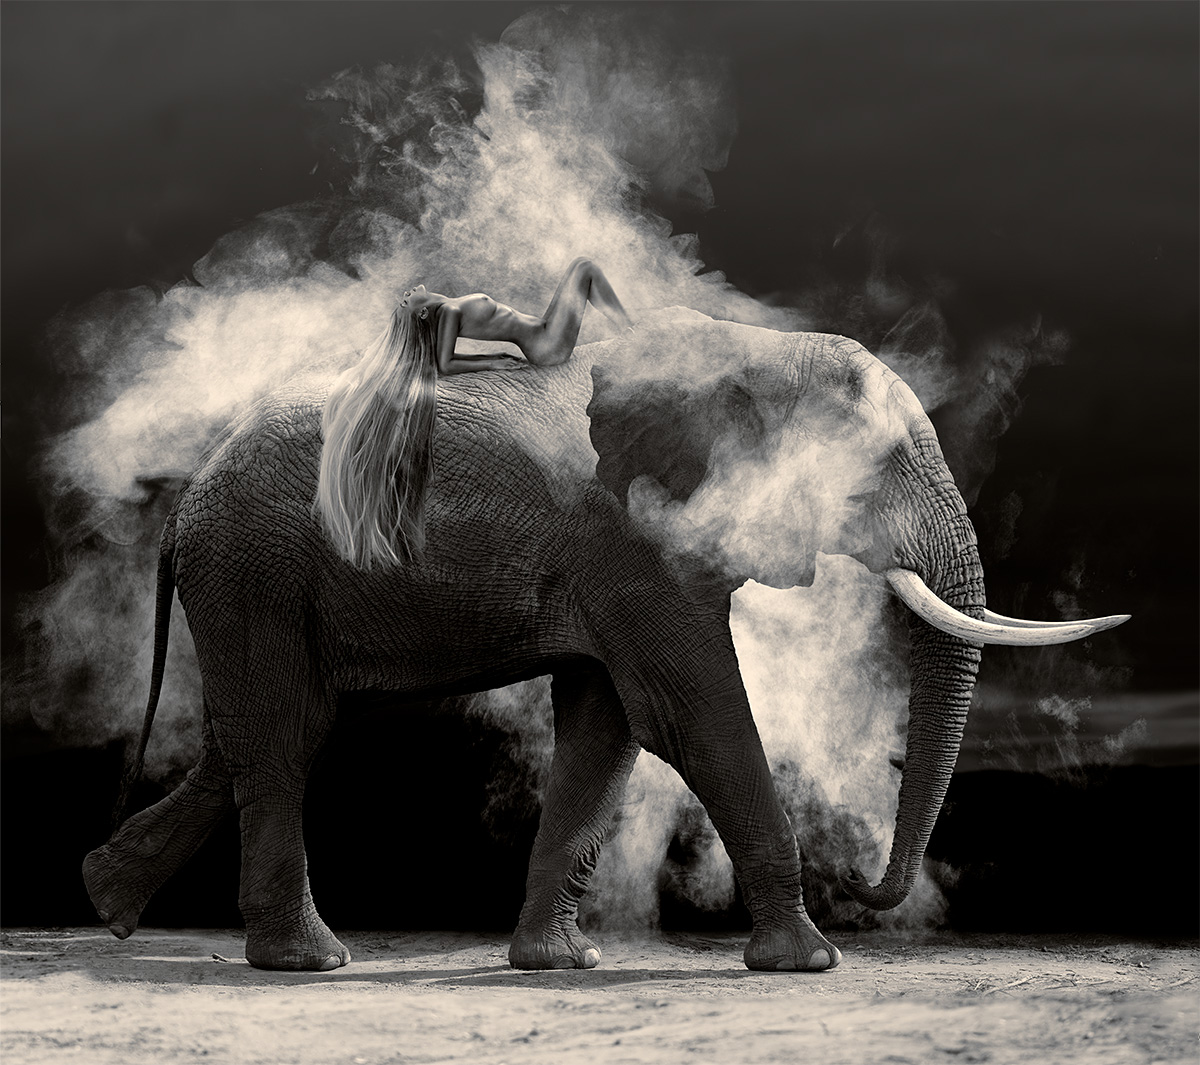 Nude Elephant Dust